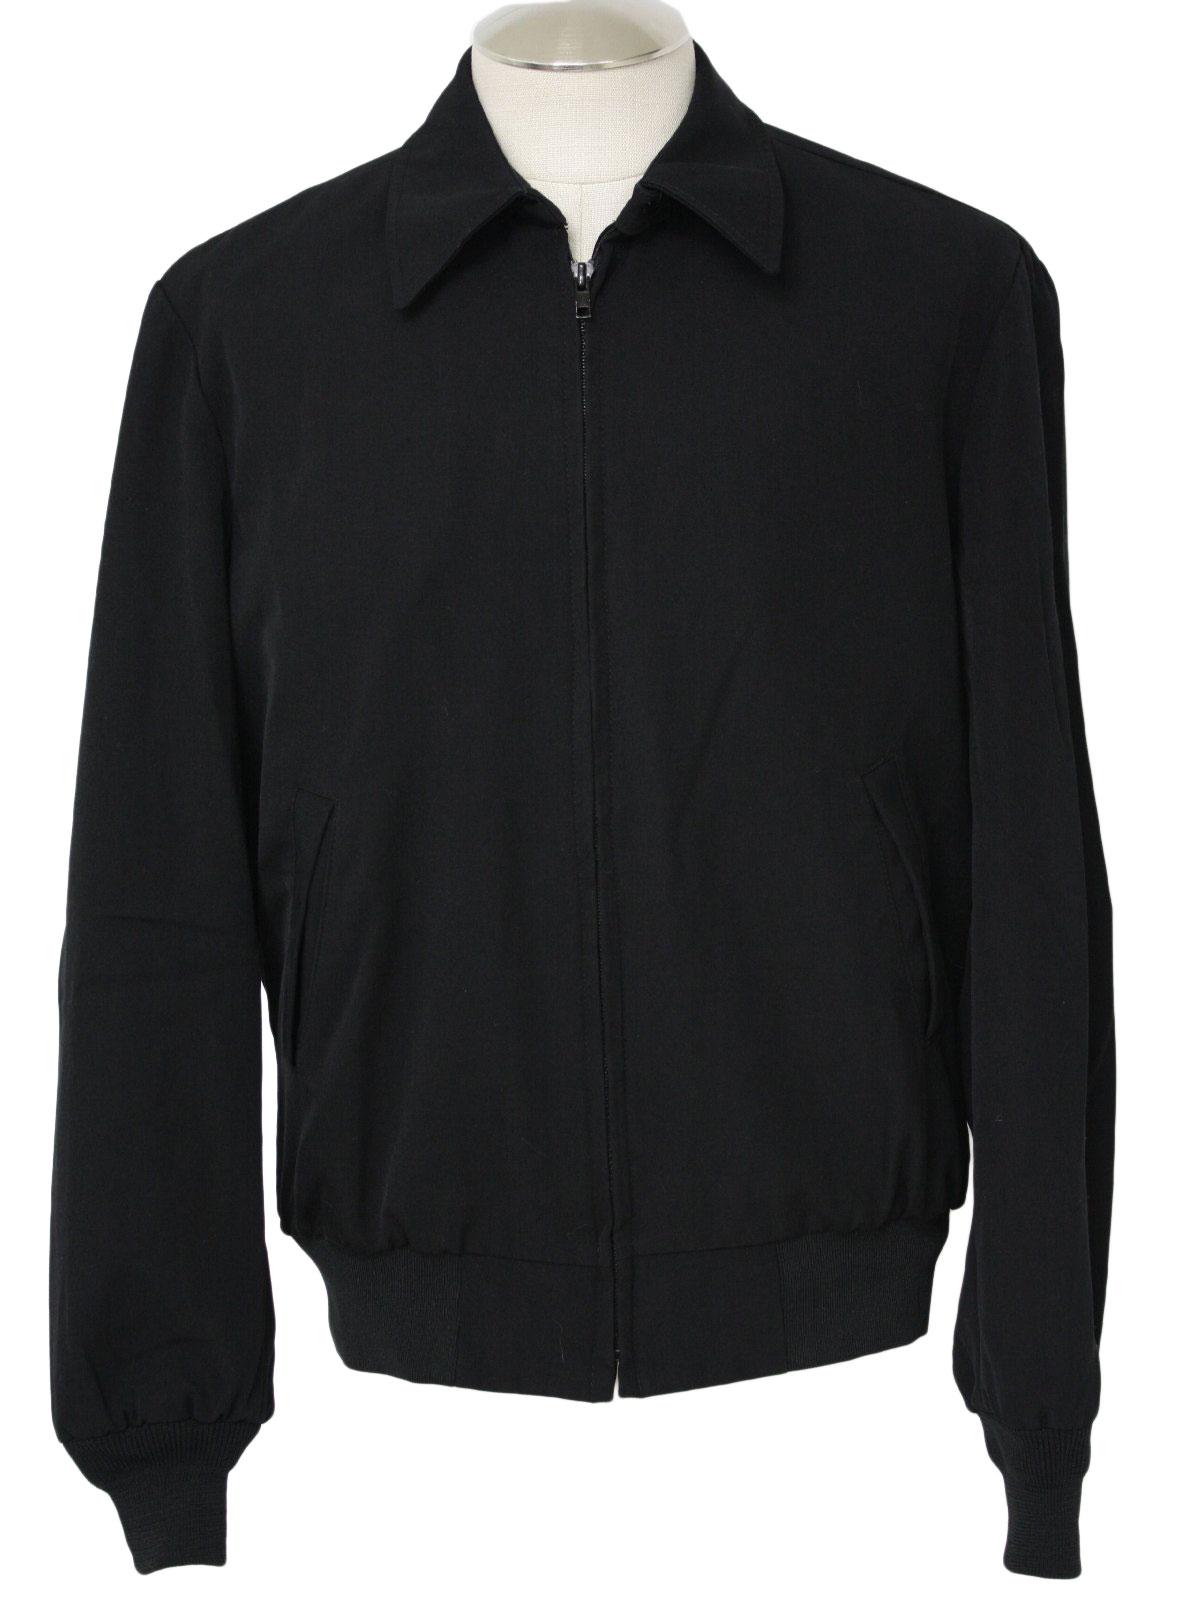 Retro 80 S Jacket 80s Neptune Garment Co Mens Black